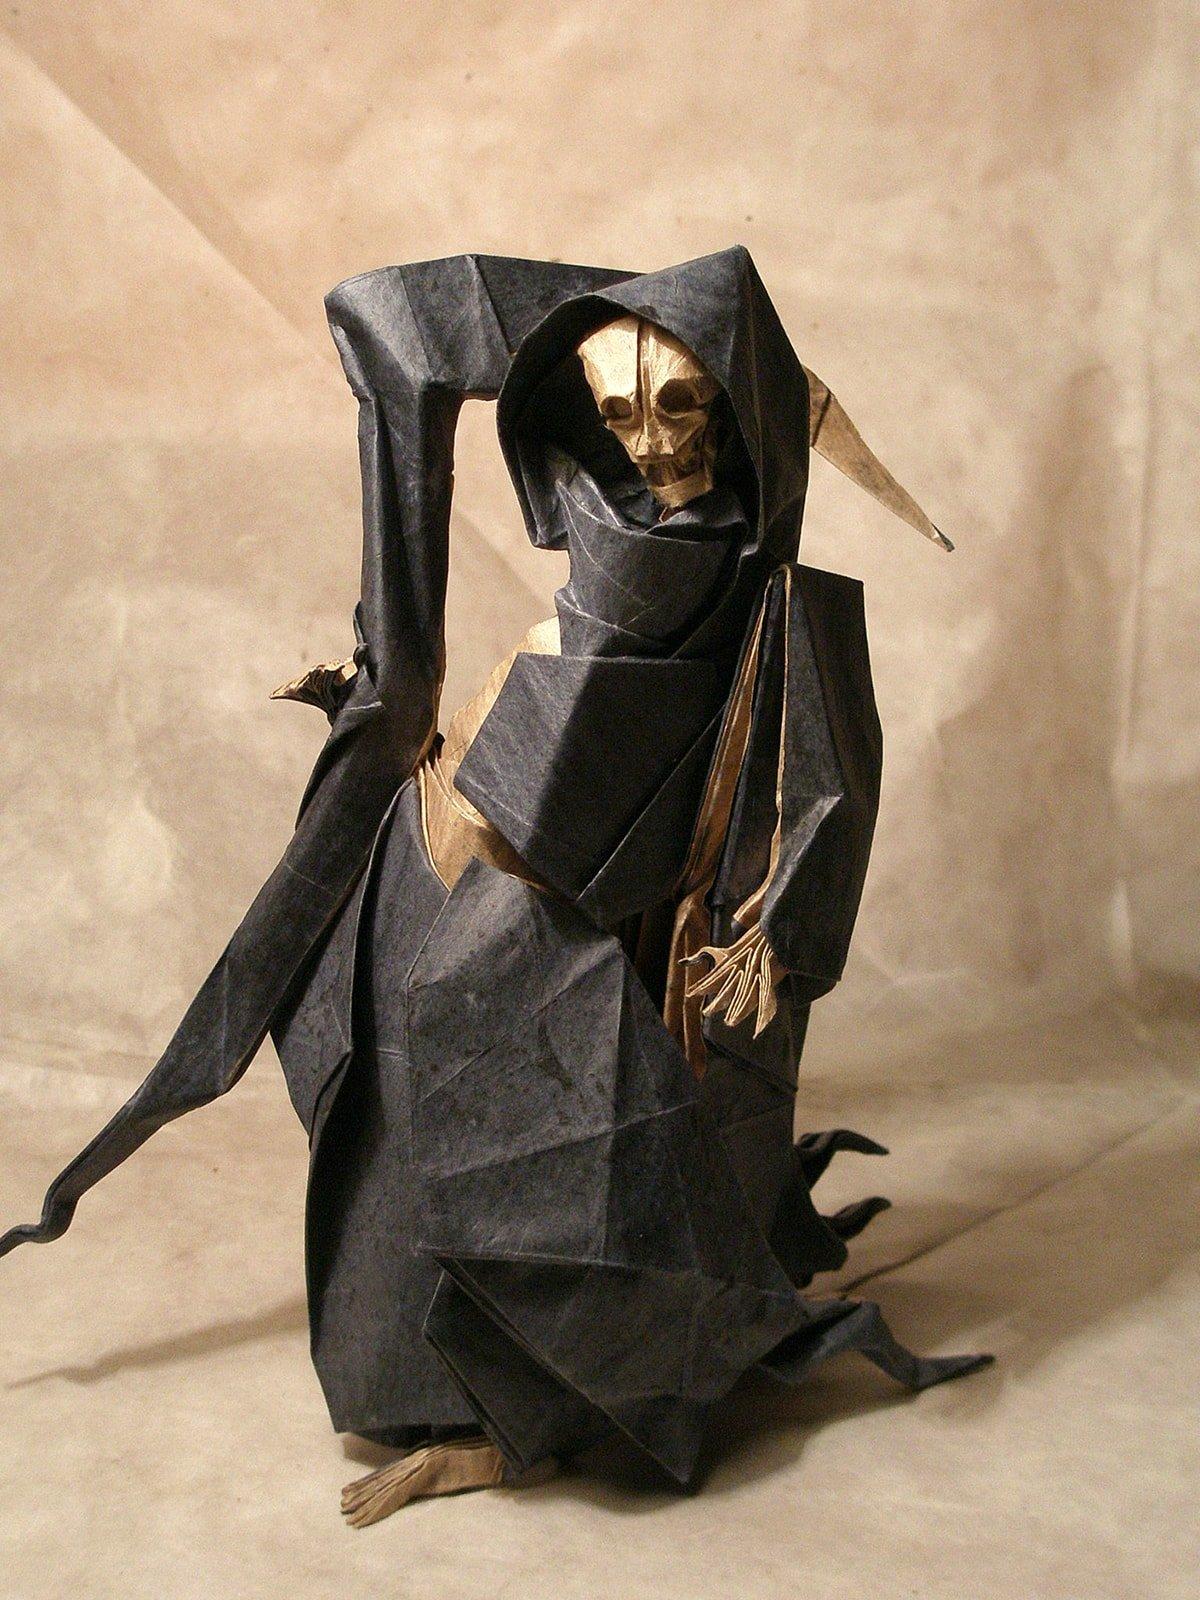 Origami Grim Reaper by Artur Biernacki